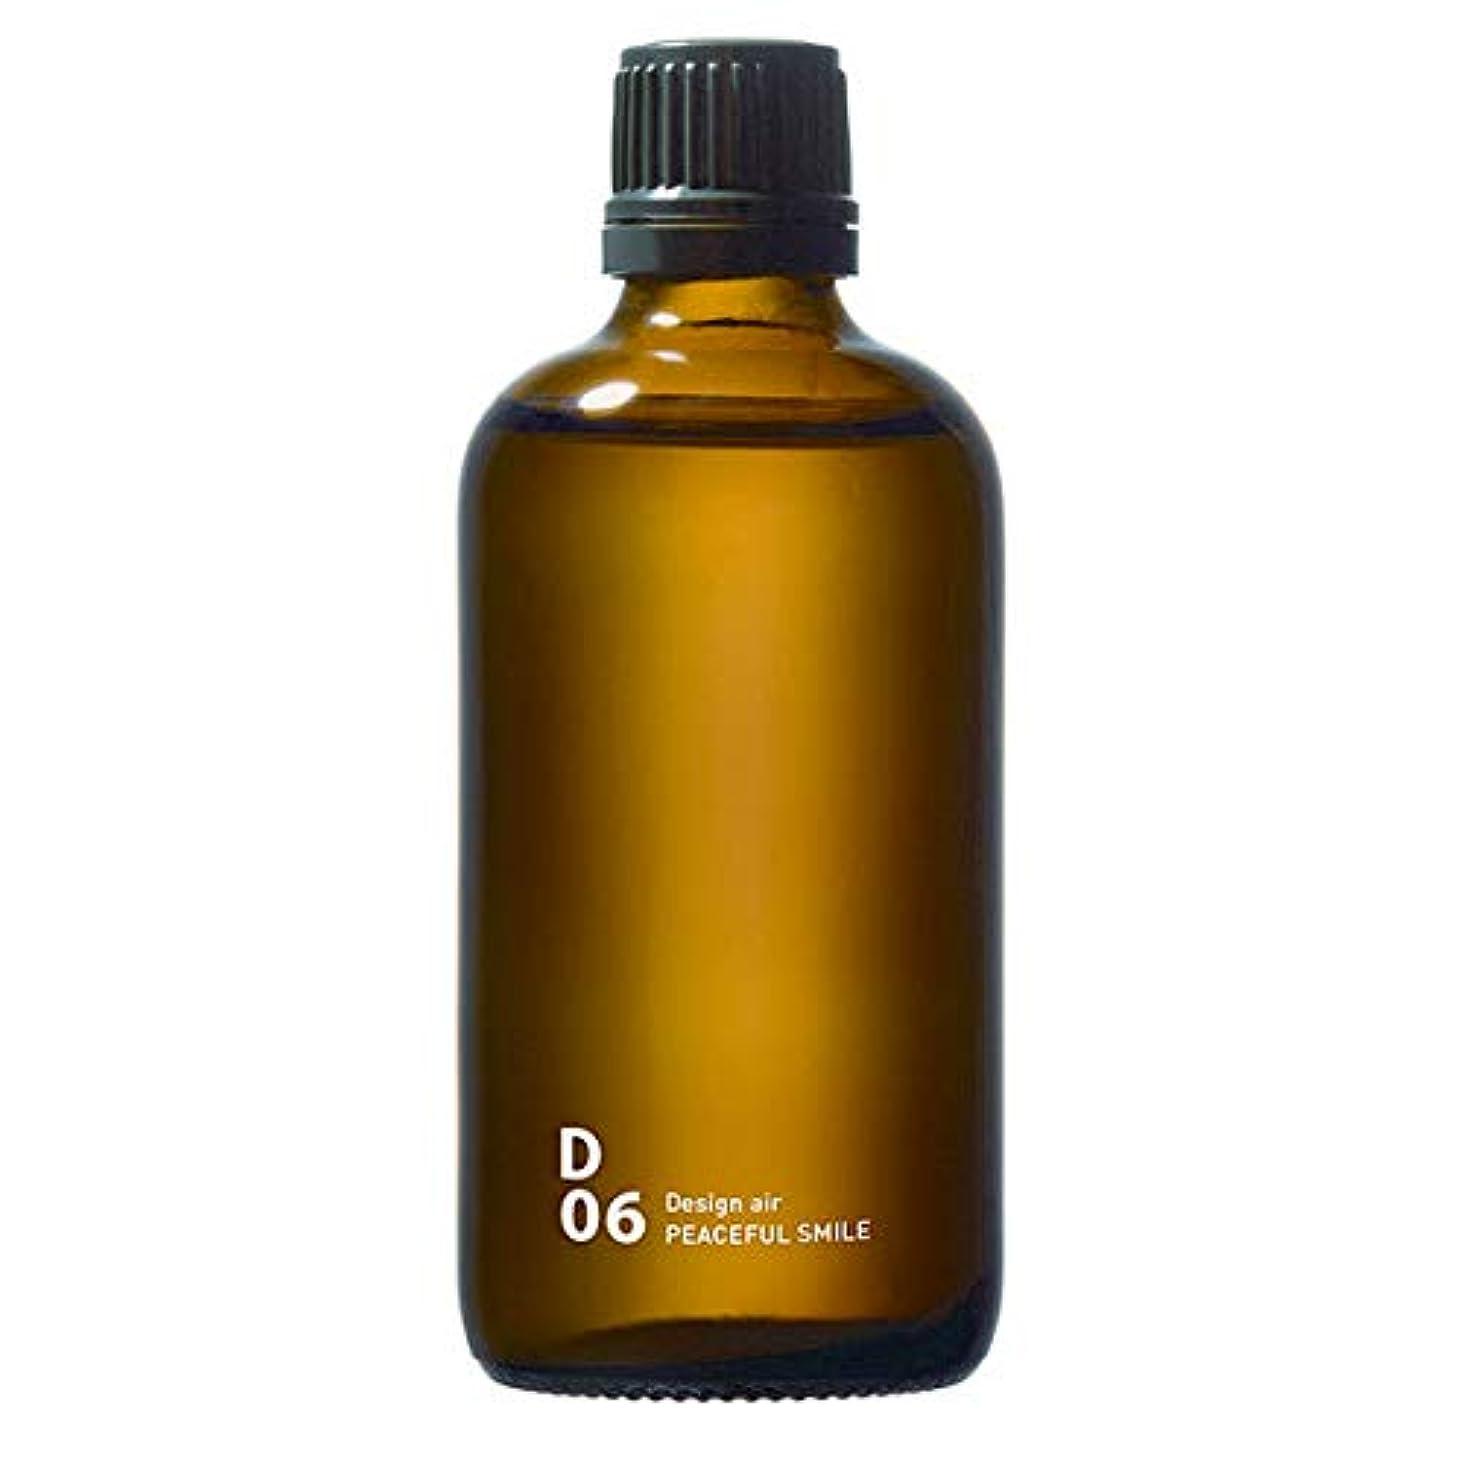 D06 PEACEFUL SMILE piezo aroma oil 100ml